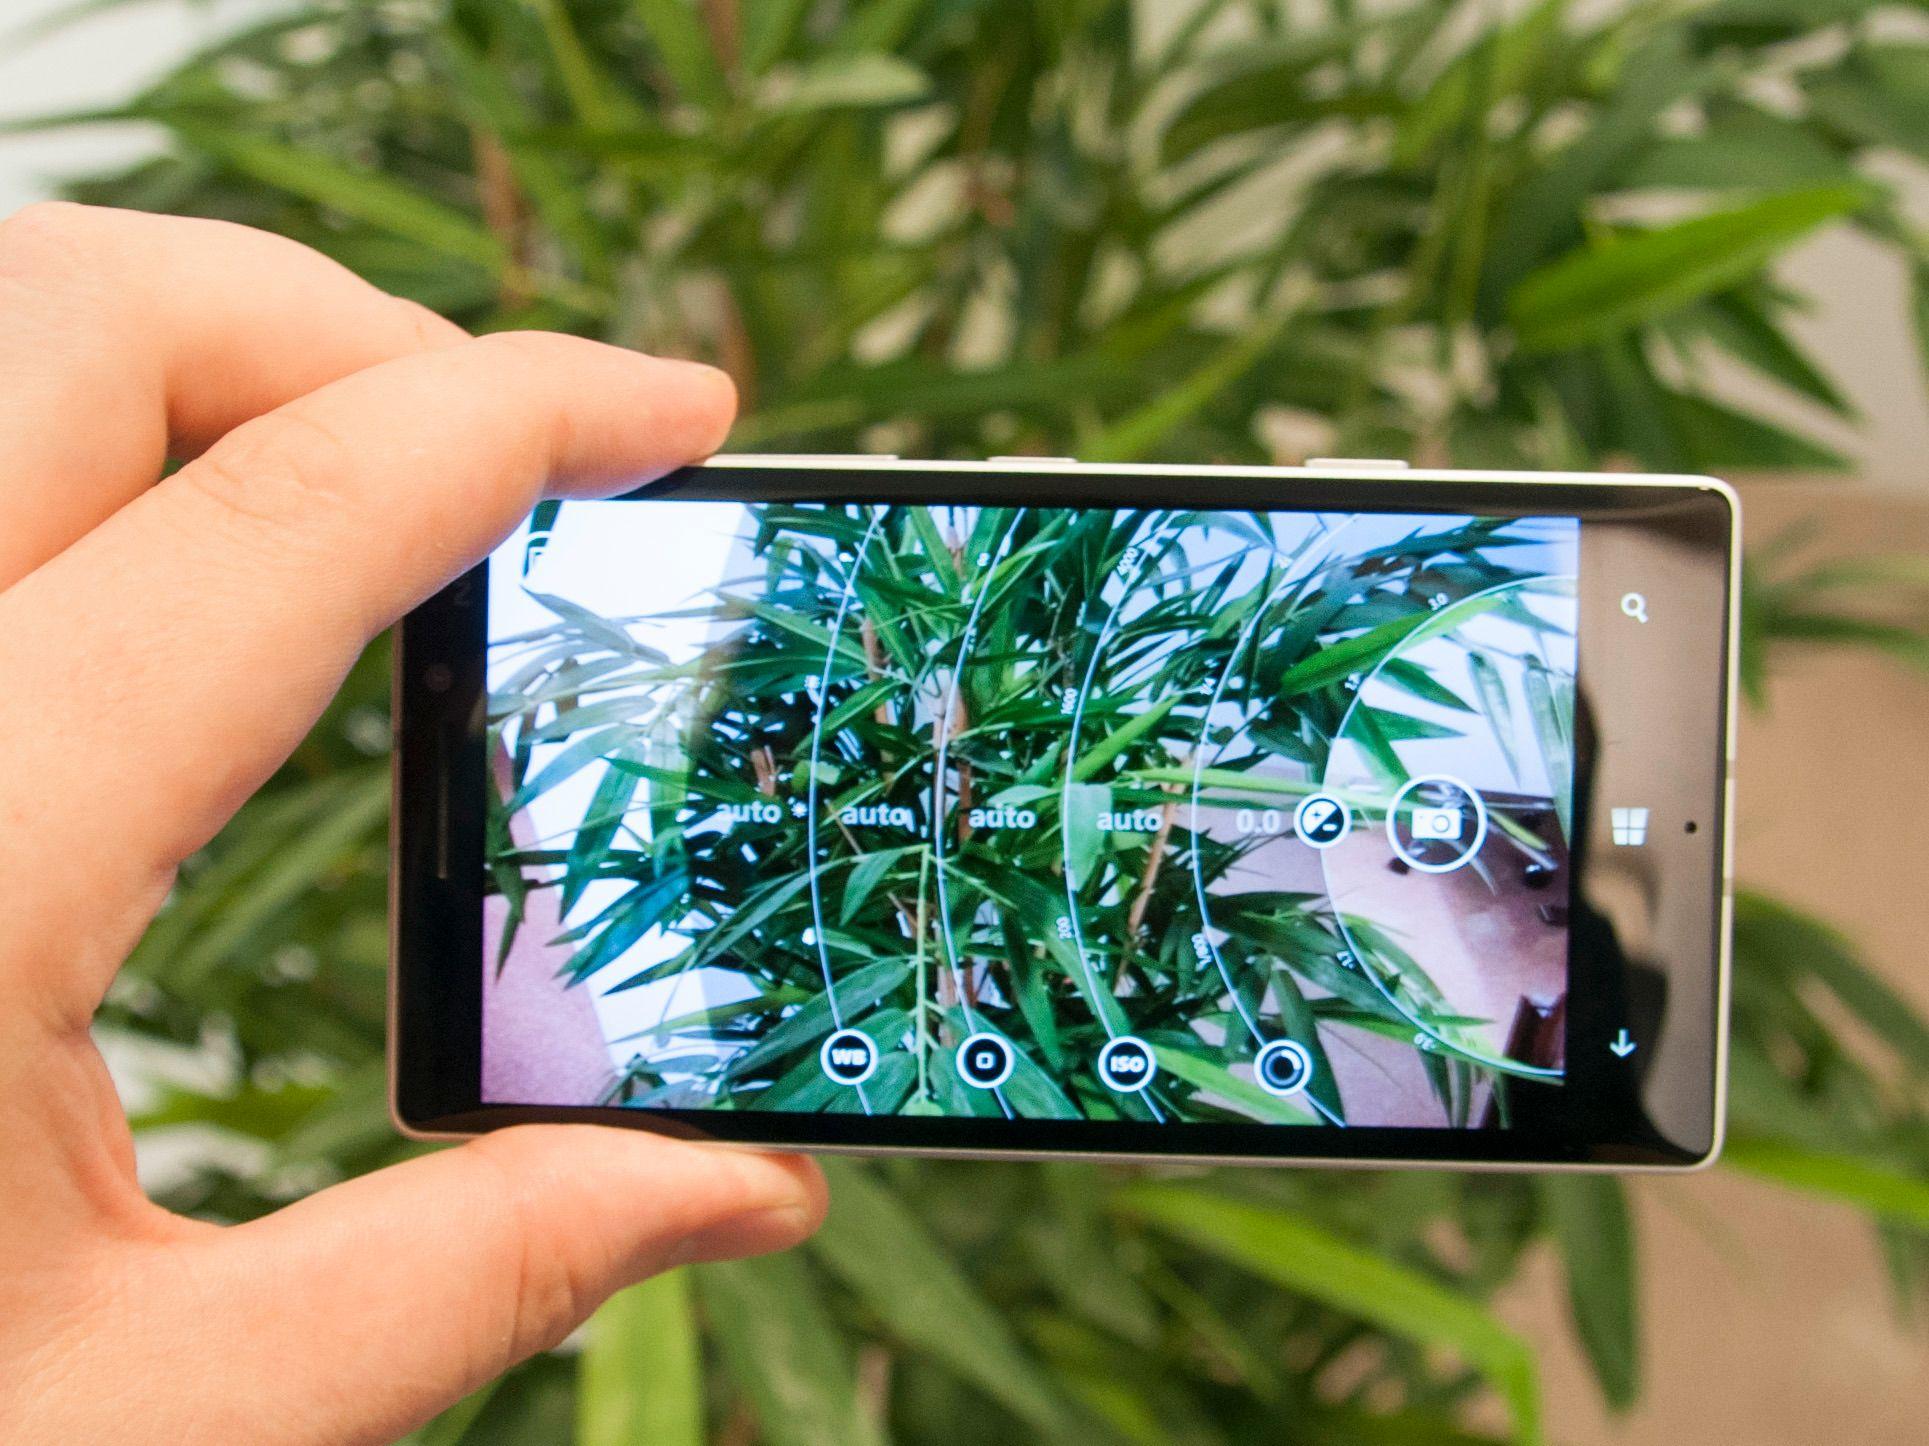 Kameraet i Lumia 930 er svært bra.Foto: Øystein W. Høie